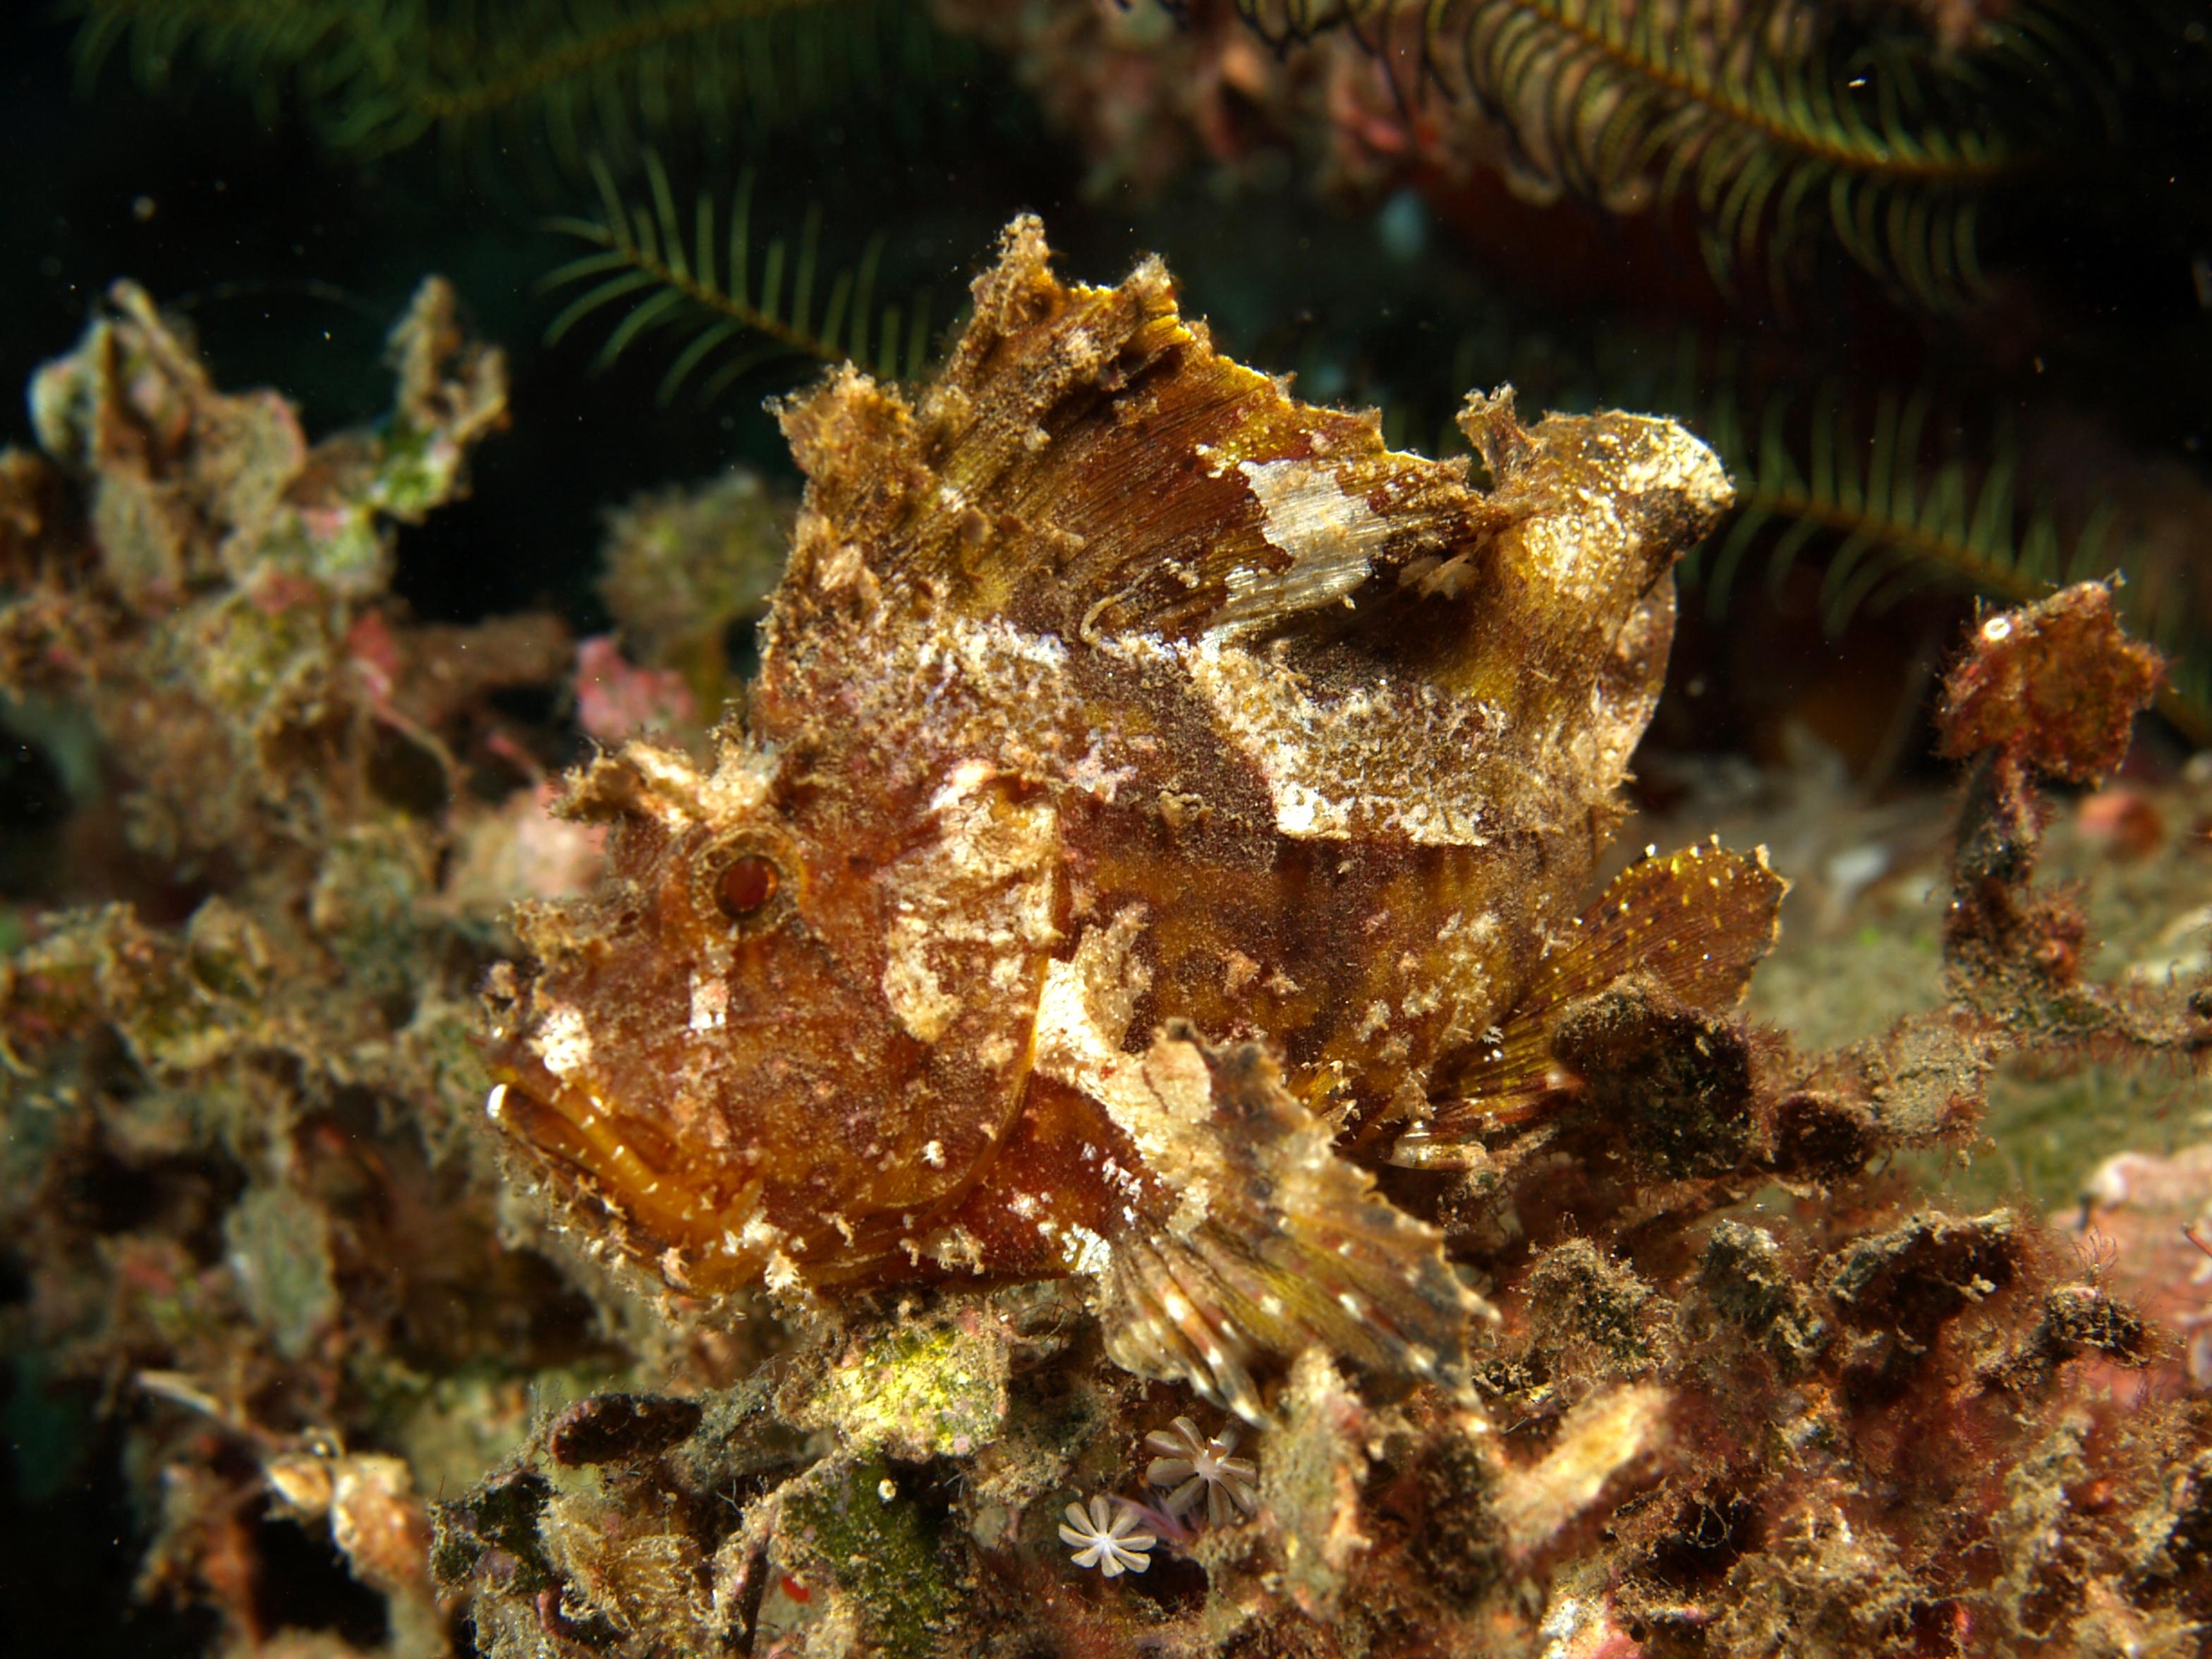 leaf scorpionfish - photo #1